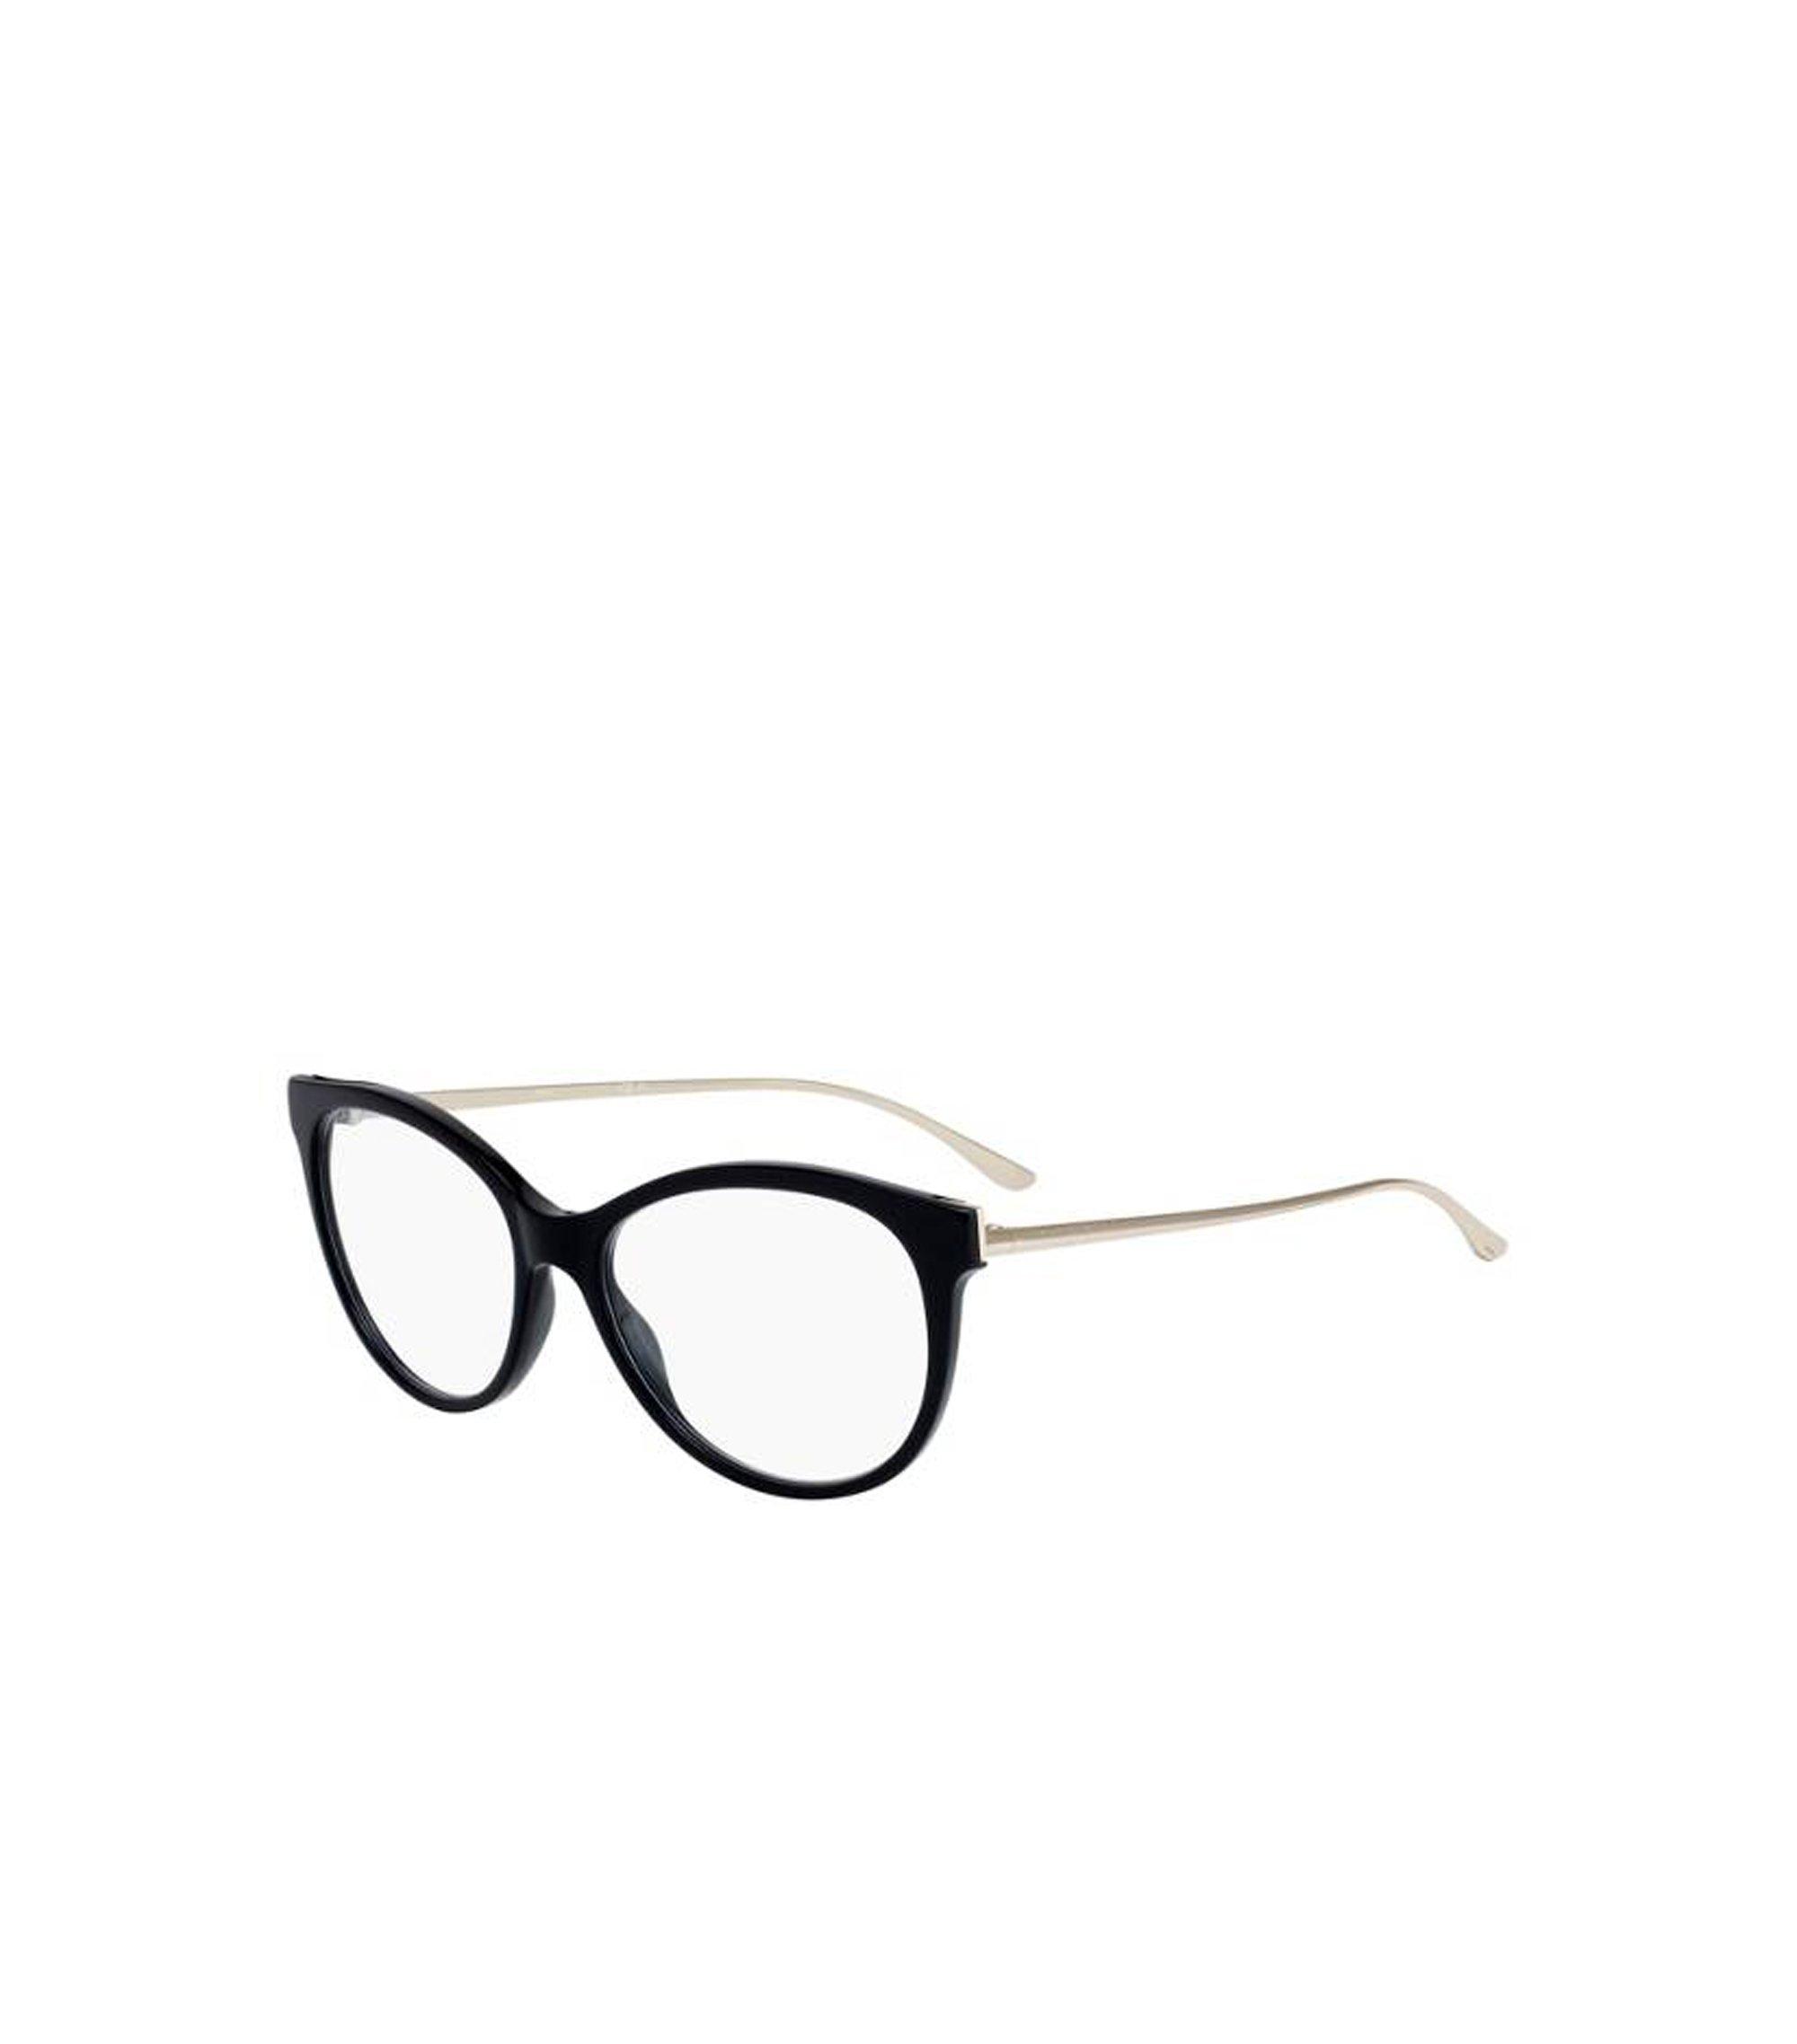 Black Acetate Cat-Eye Optical Frames | BOSS 0894 RHP, Assorted-Pre-Pack